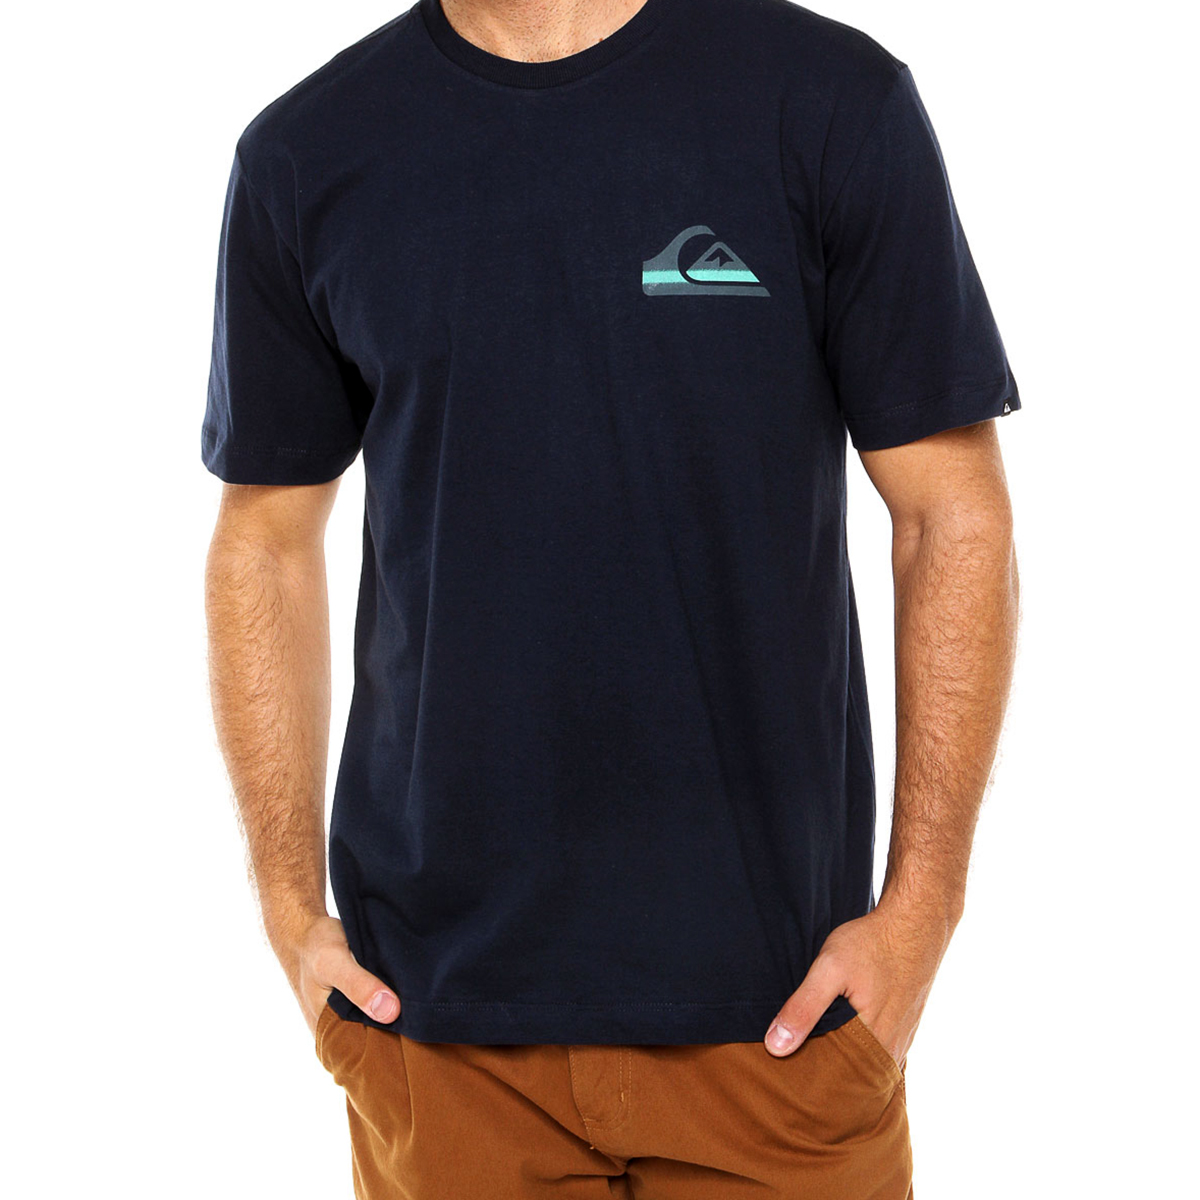 Camiseta Quiksilver Neon Masculina - Marinho